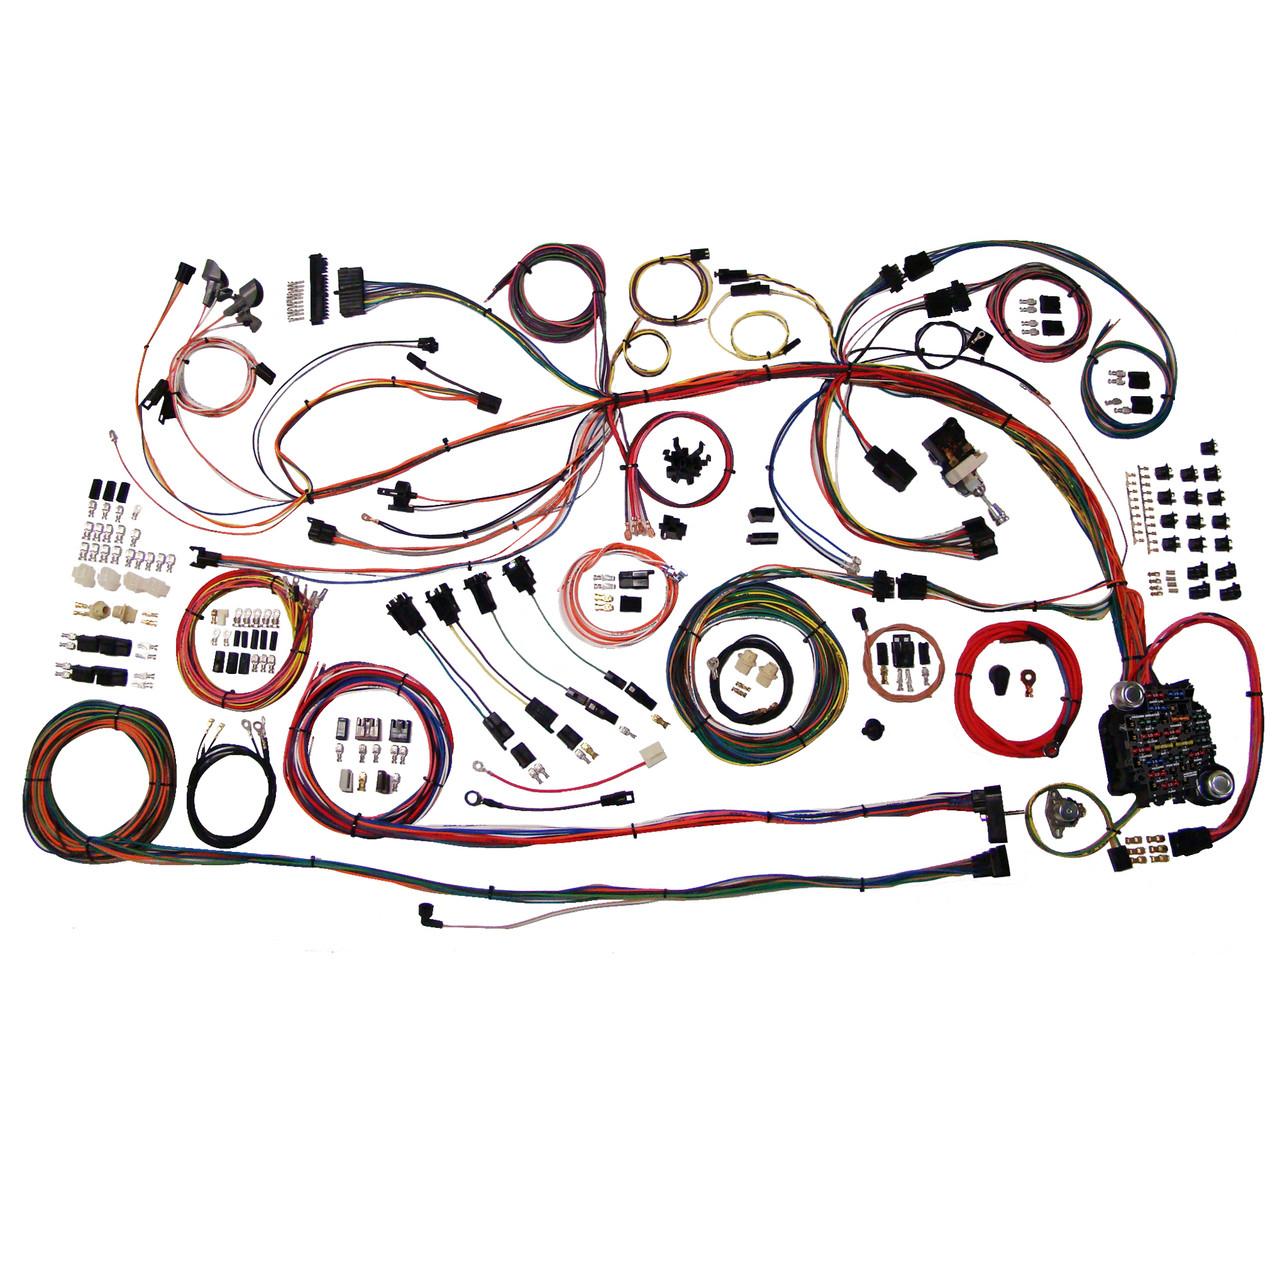 wiring harness 1964 el camino wiring diagram centre 1966 el camino wiring harness [ 1280 x 1280 Pixel ]